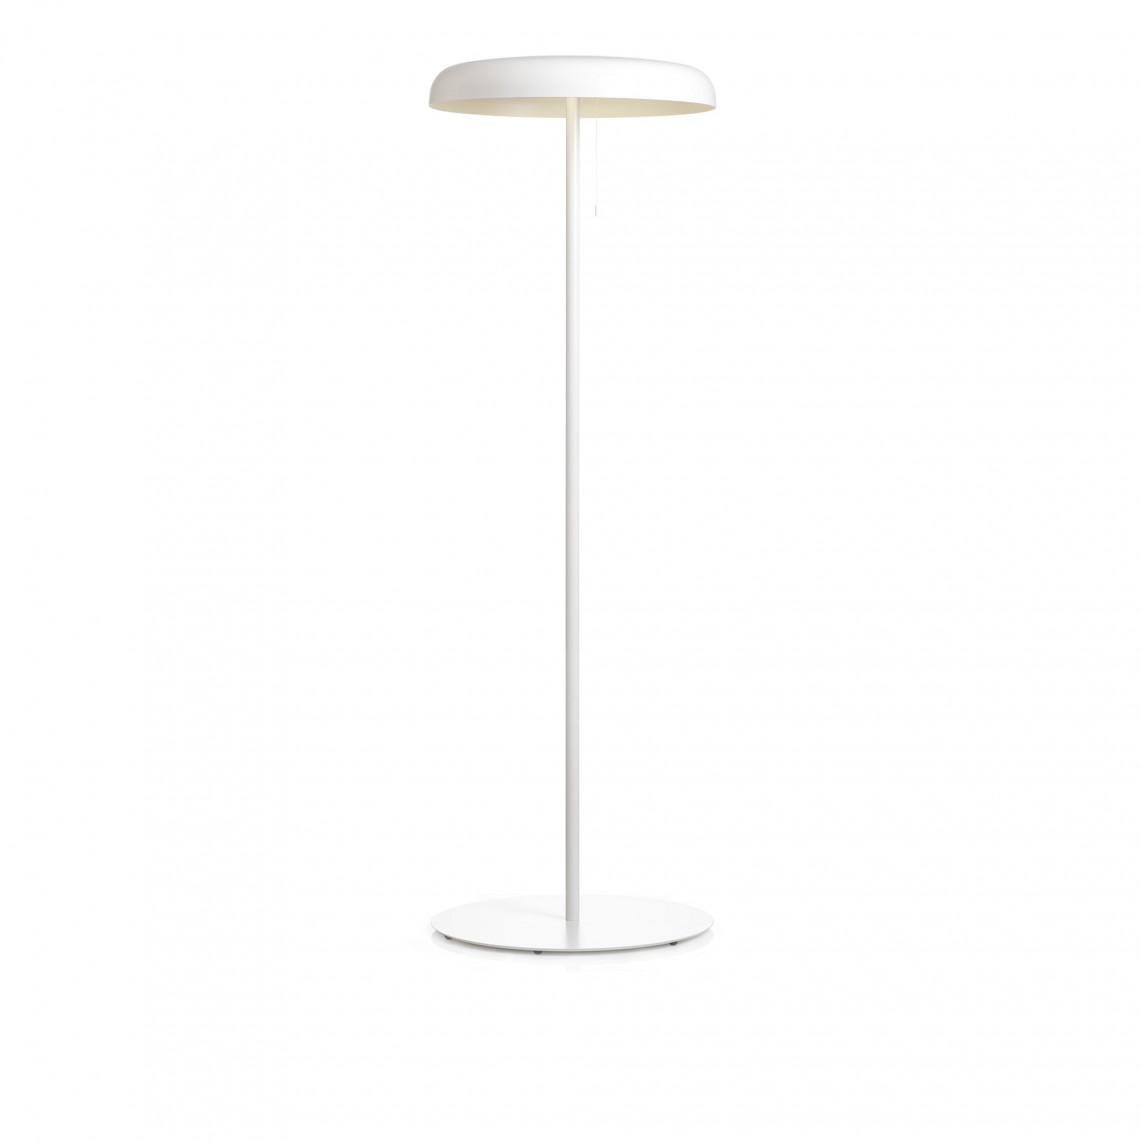 Mushroom - Golvlampa Vit